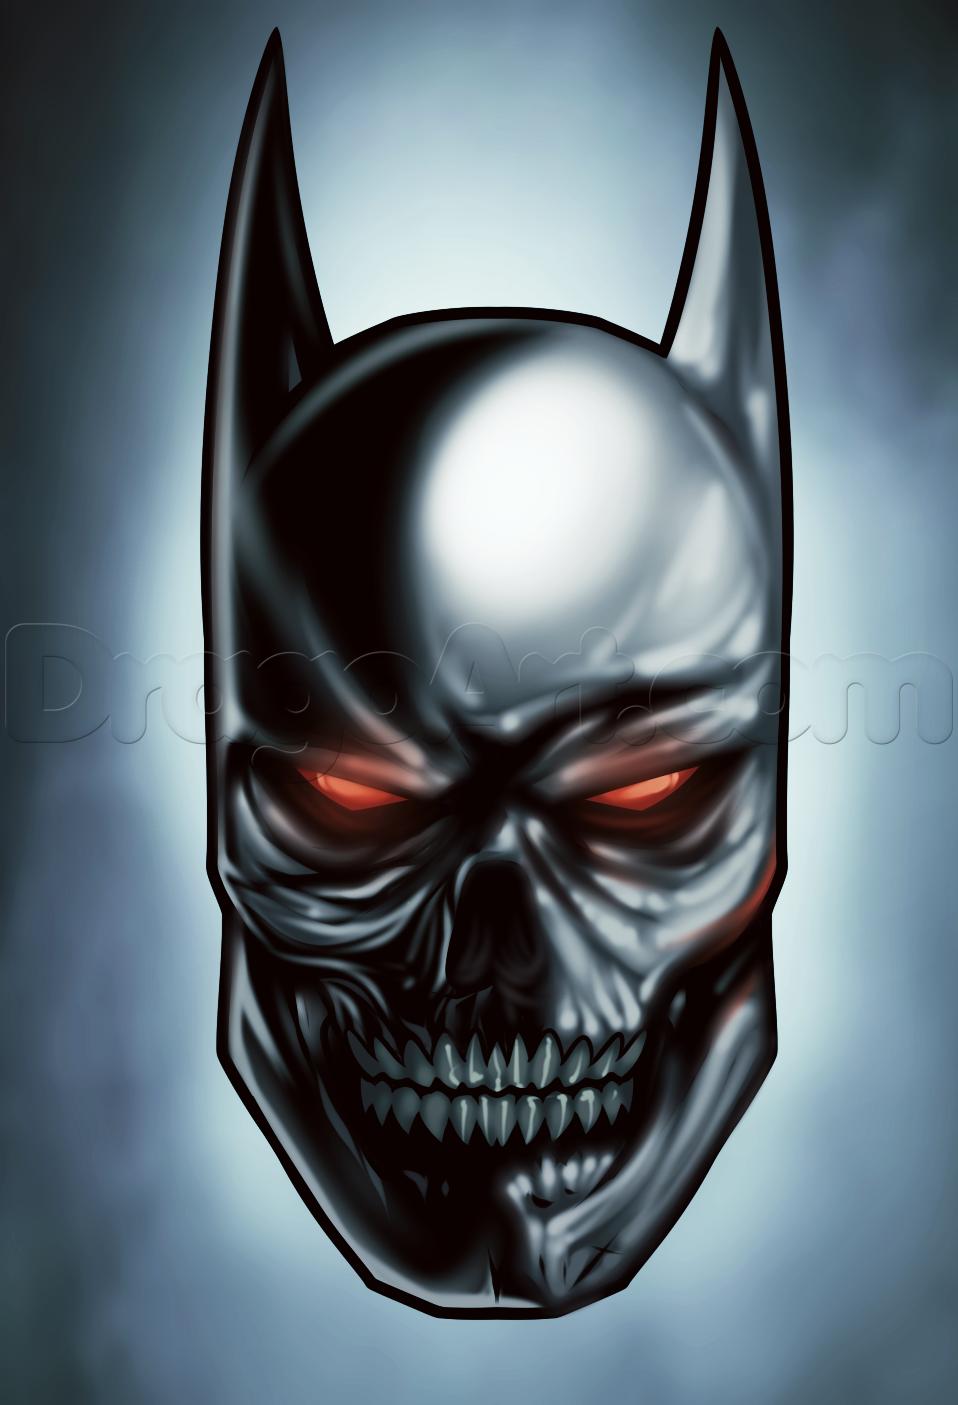 958x1405 How To Draw A Batman Skull, Step By Step, Dc Comics, Comics, Free